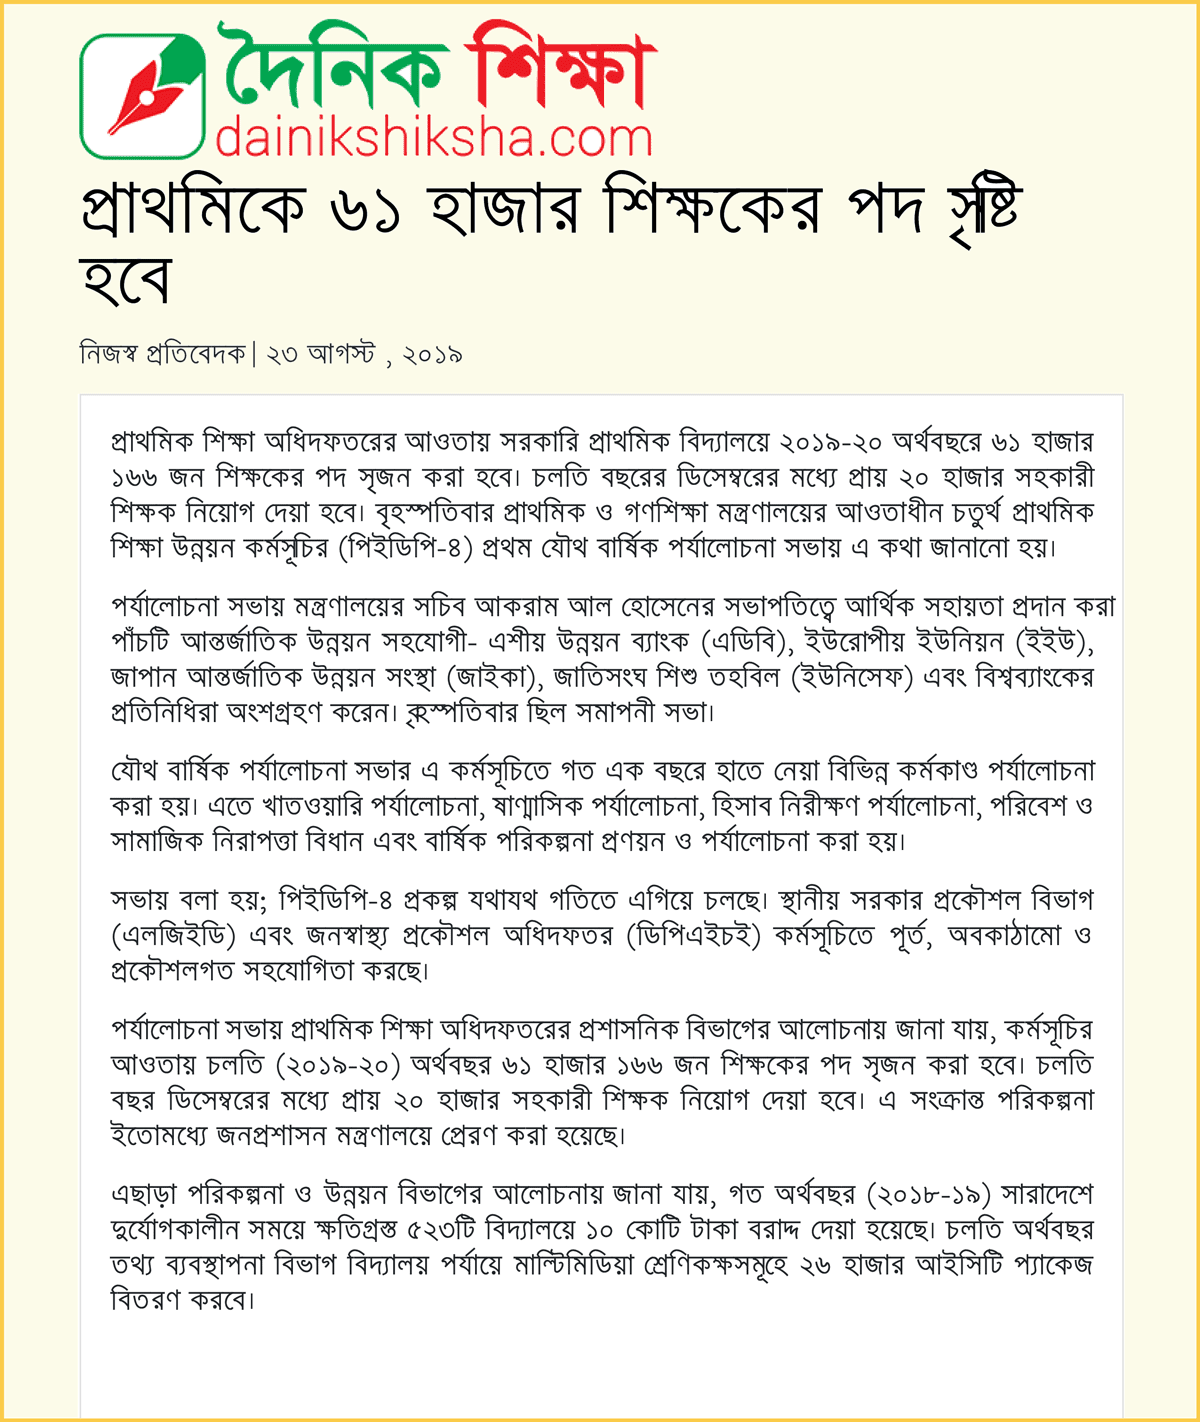 DPE Job Circular 2019 Latest news